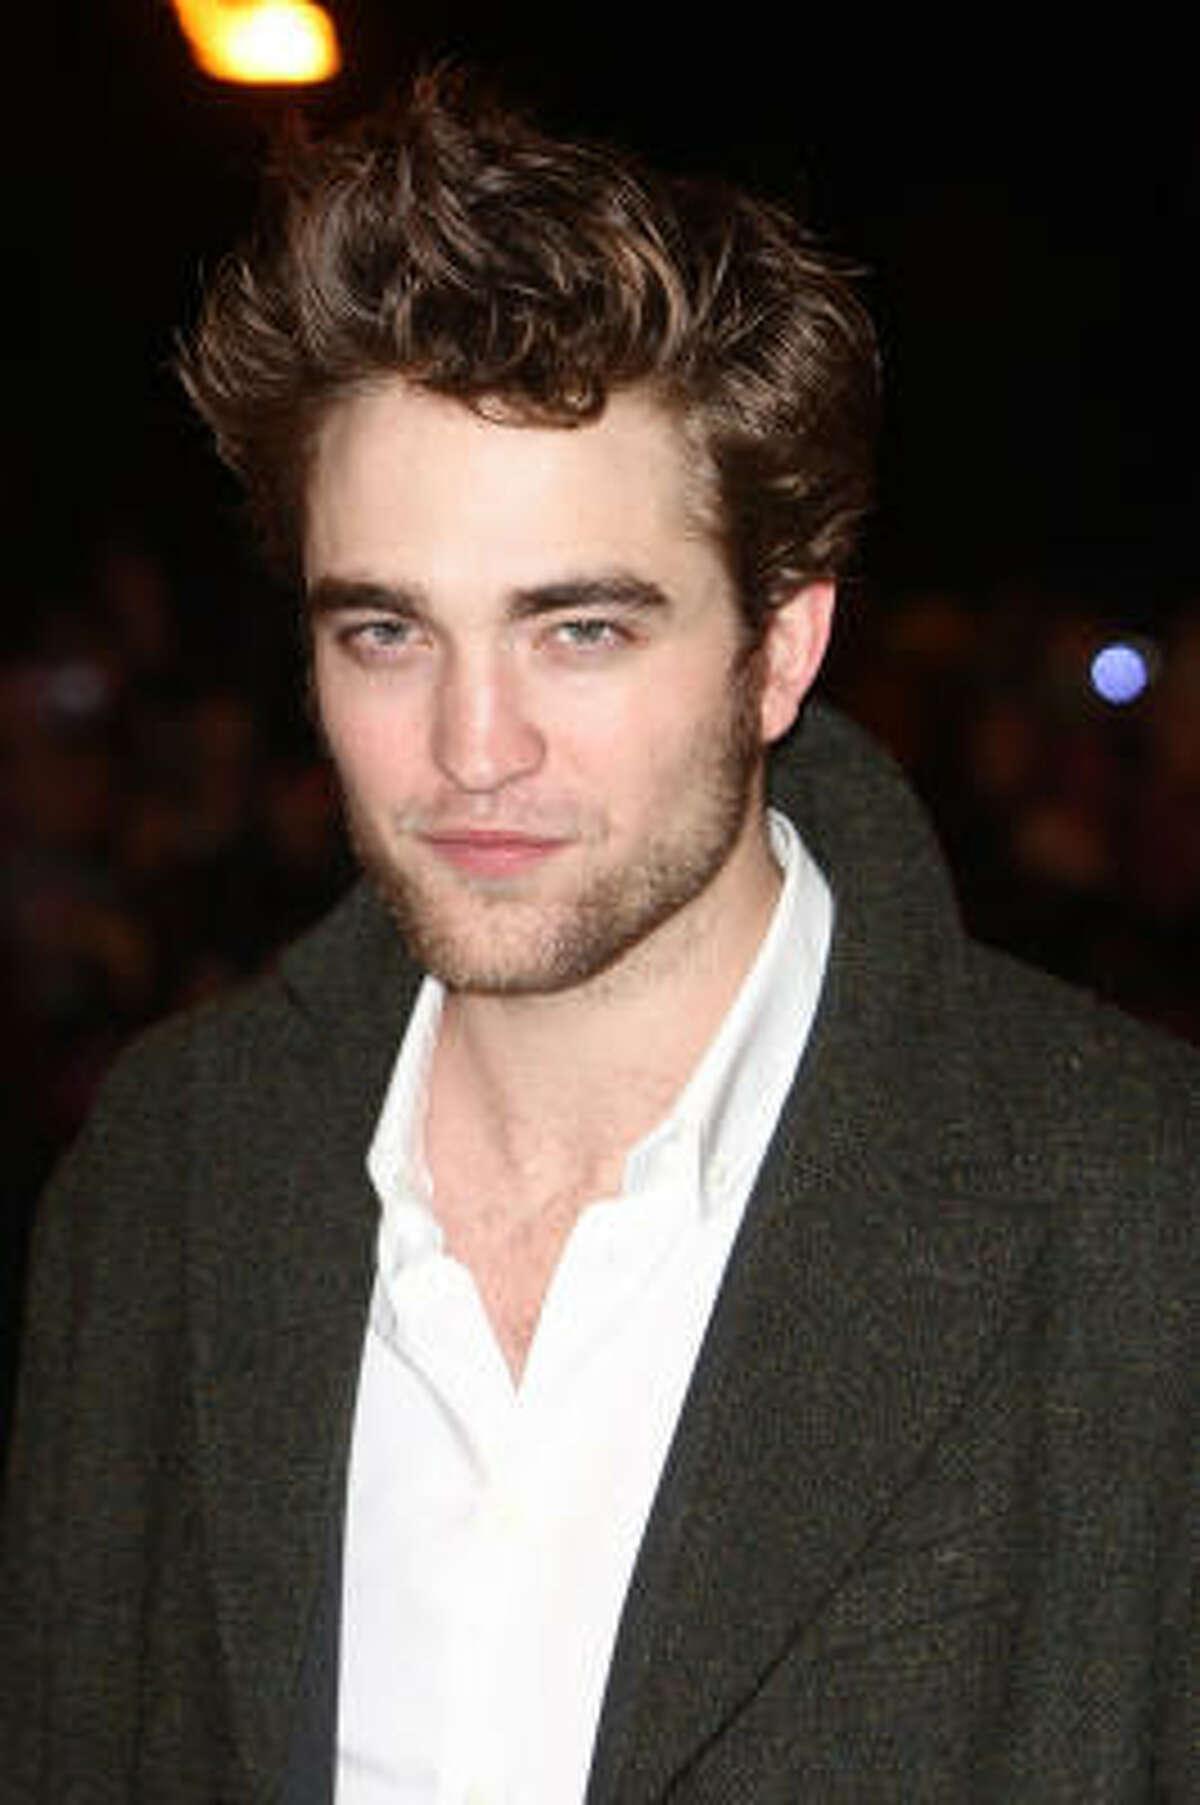 Robert PattinsonThe Twilight series